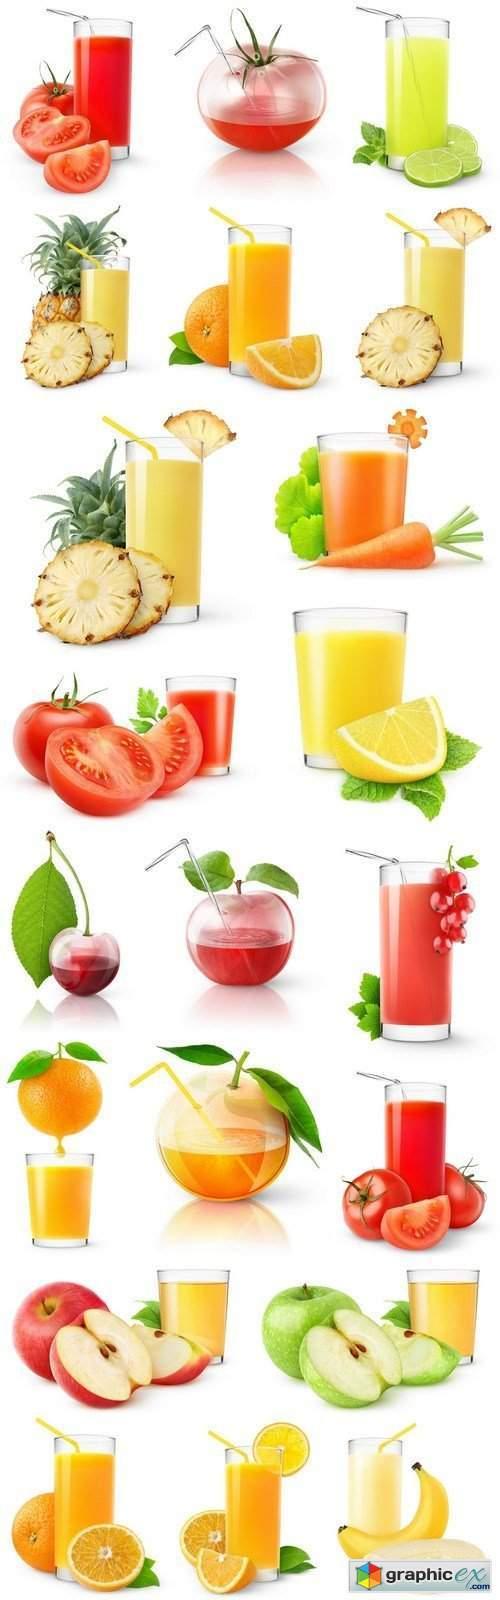 Fresh juice on a white background 2 - 21xUHQ JPEG Photo Stock